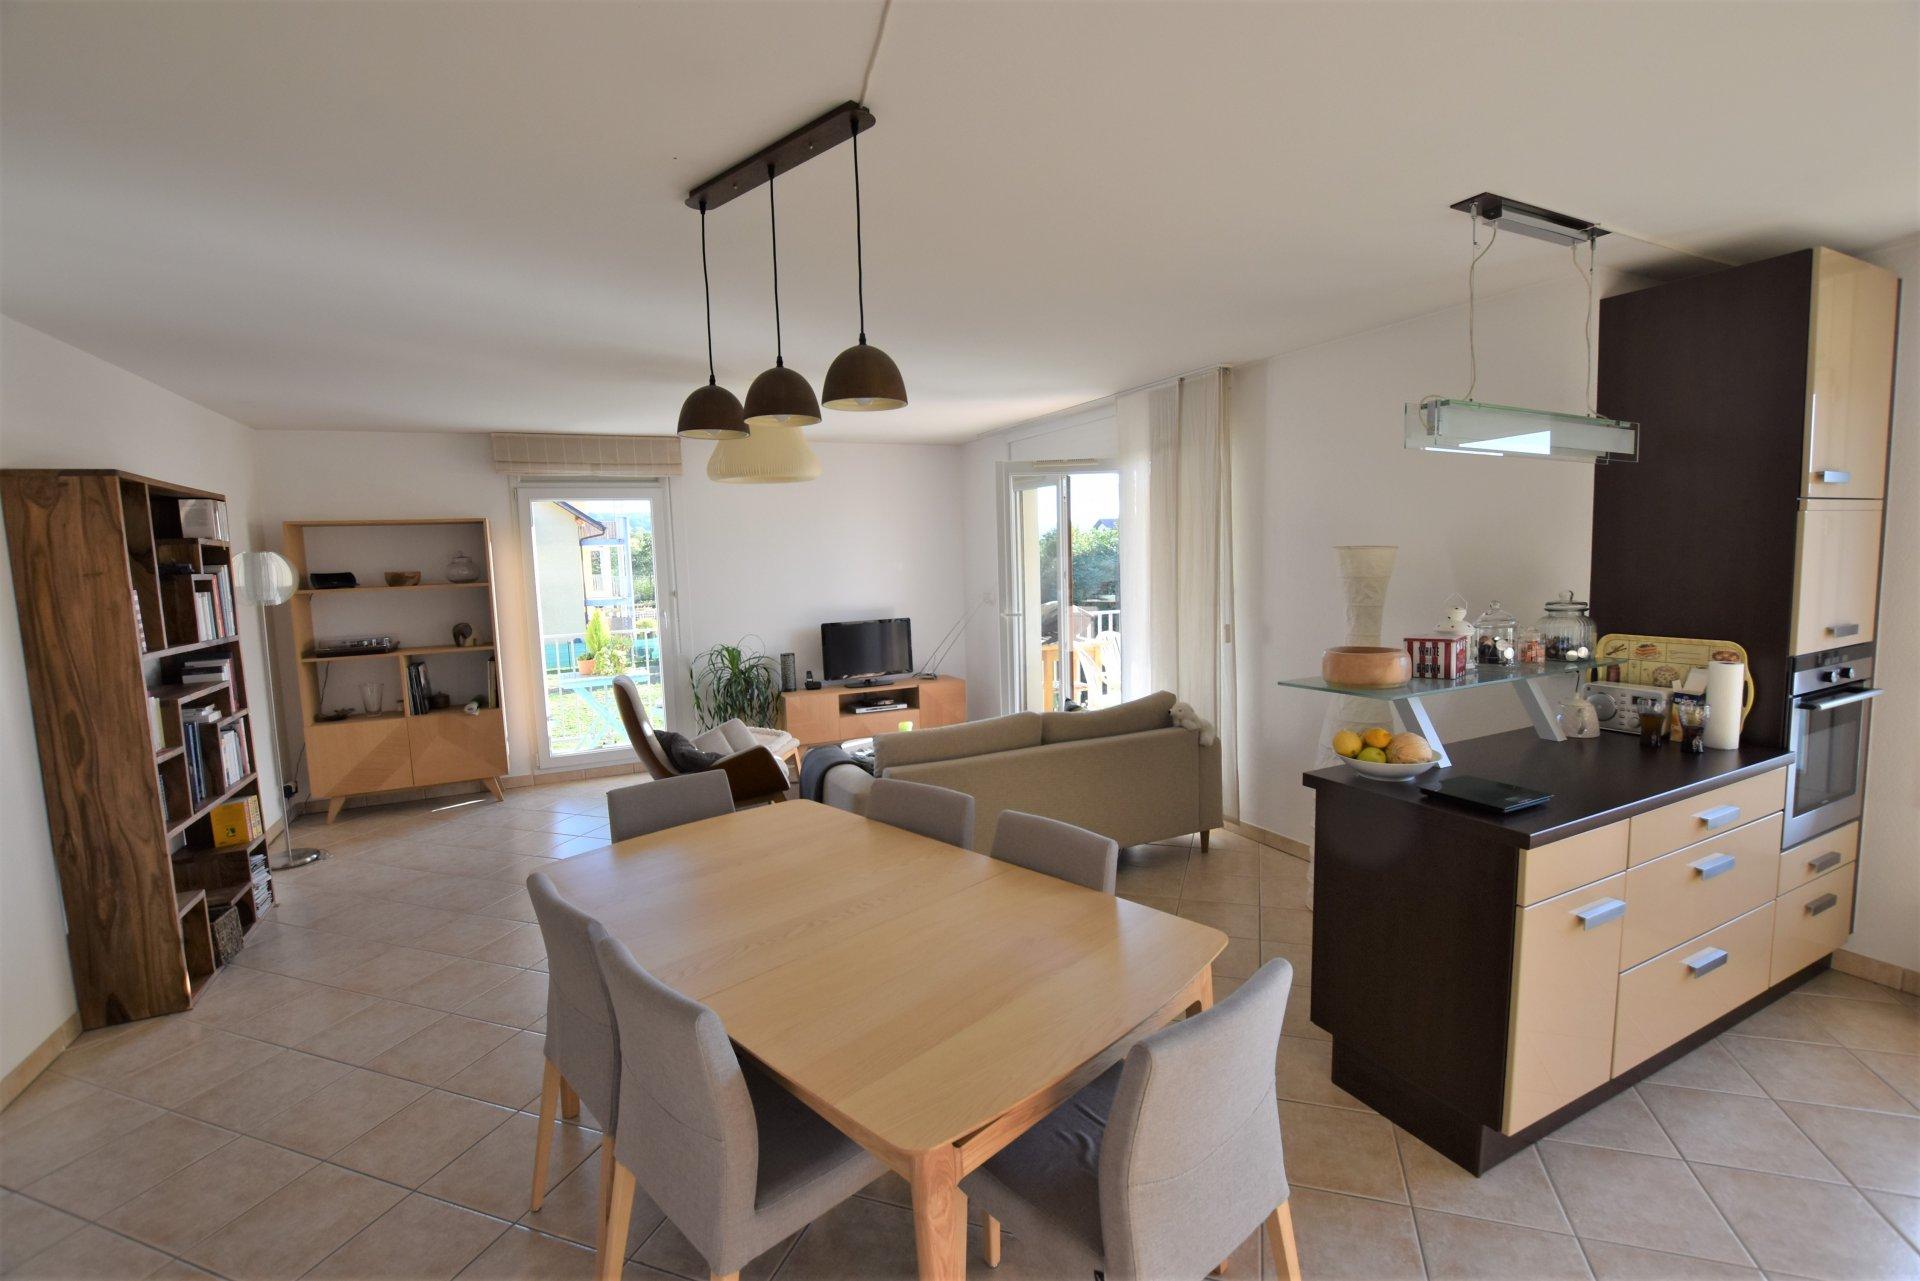 A vendre grand T3 85 m² - NEYDENS